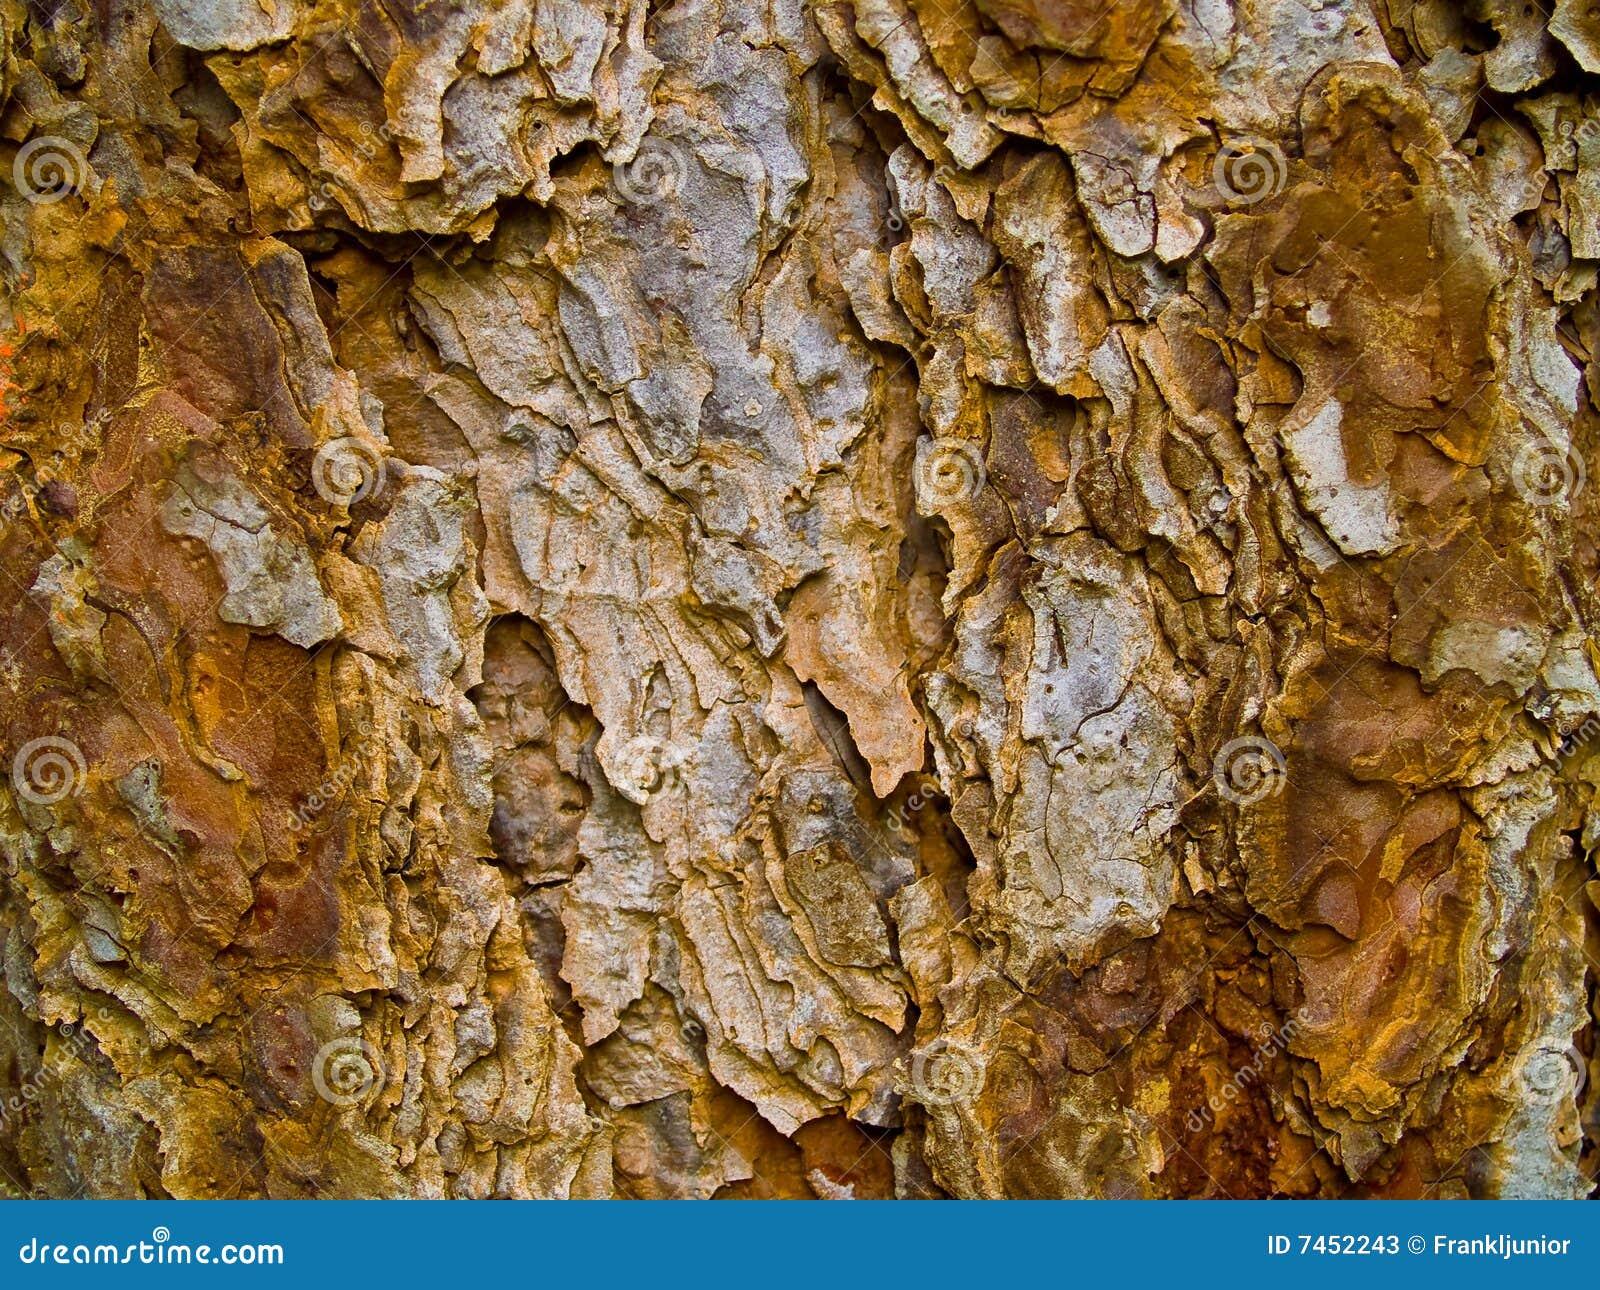 evergreen tree bark background - photo #4